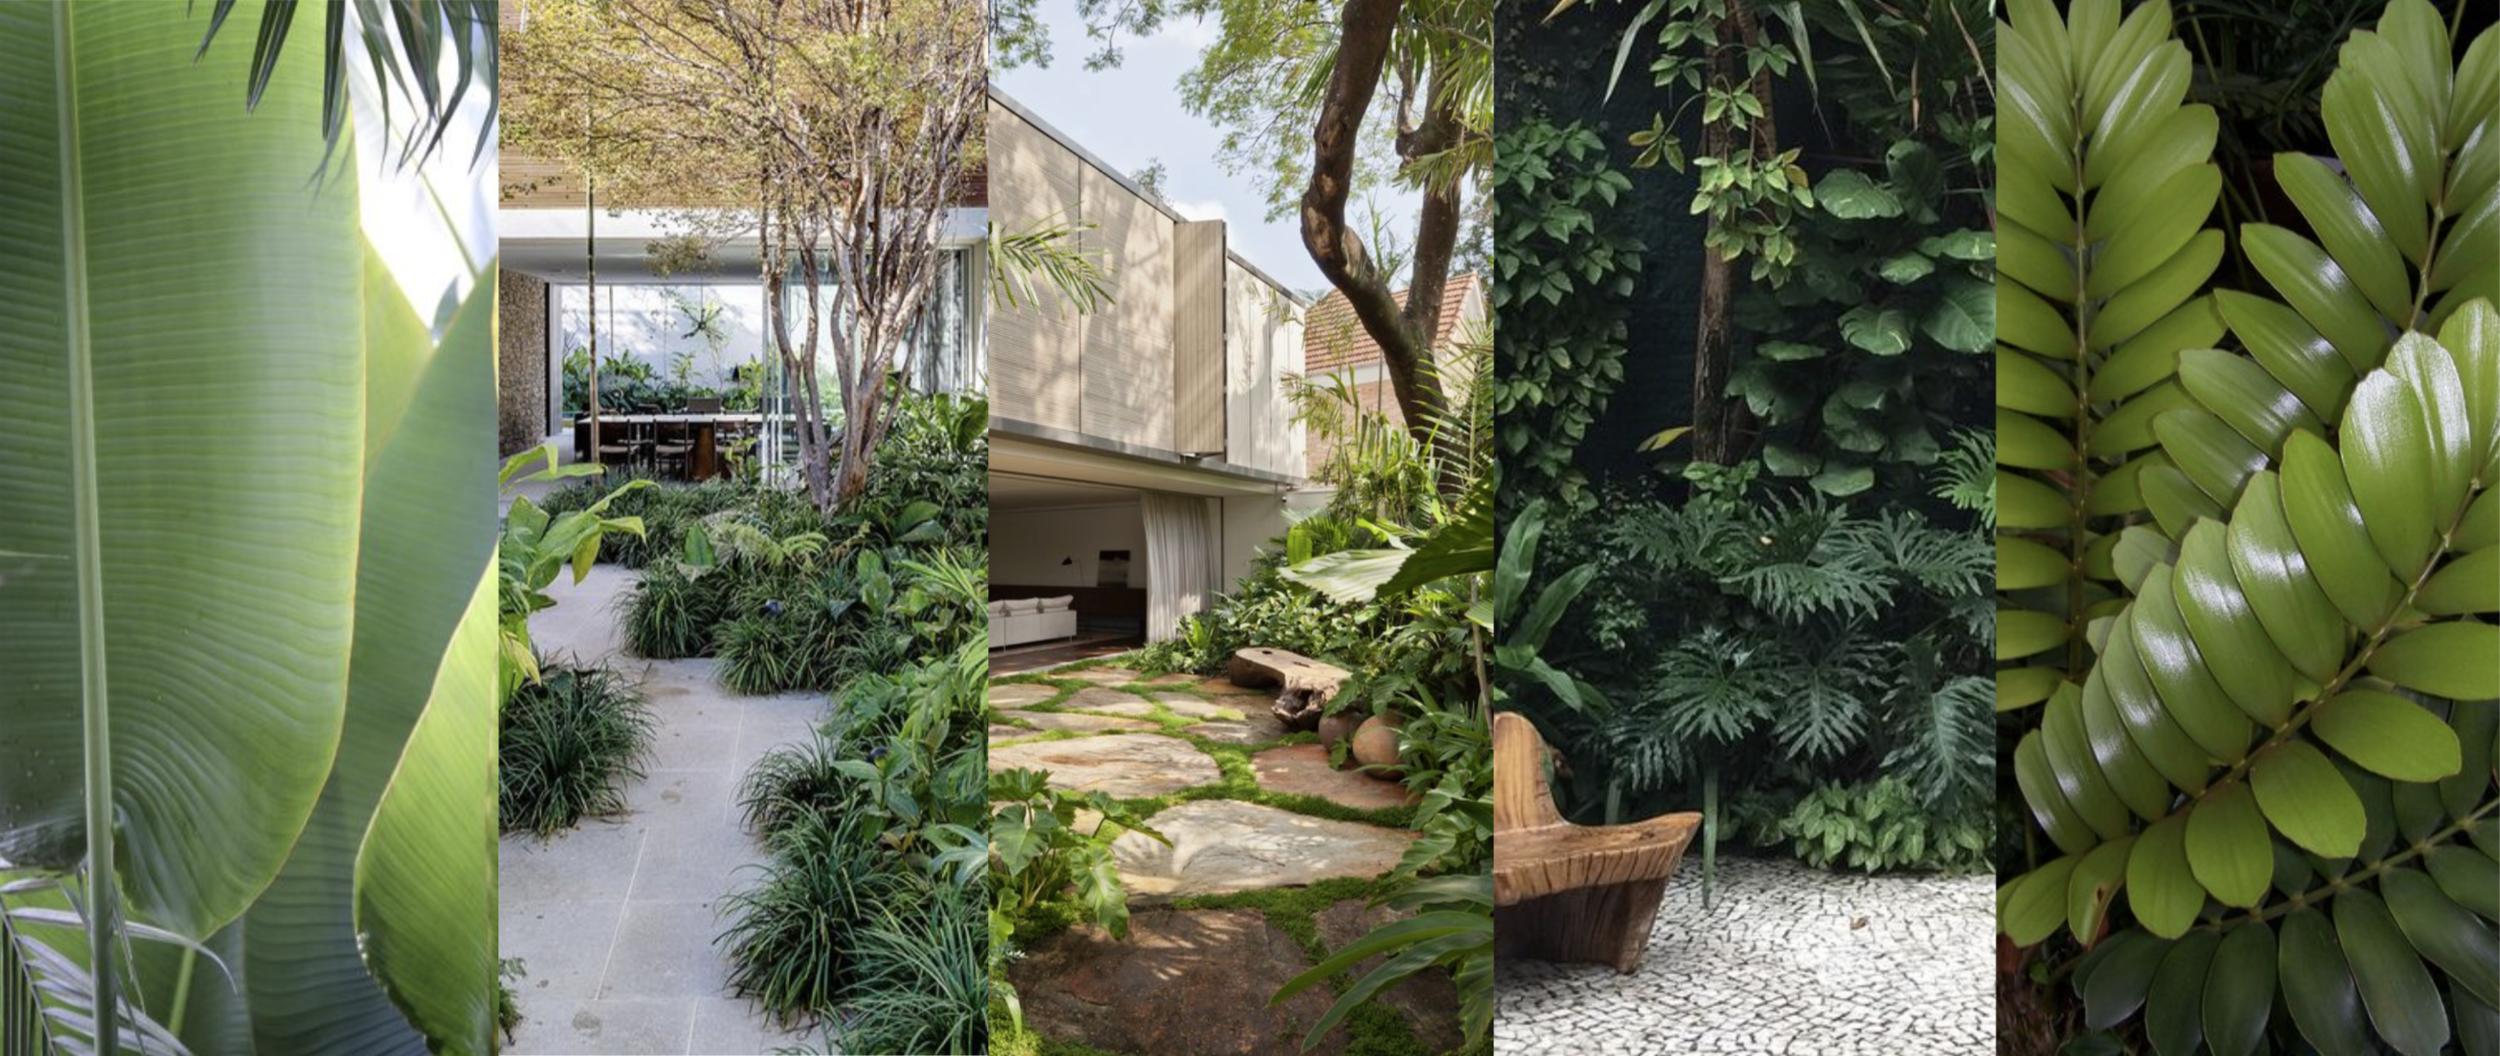 Jardín Tropical / Selvático